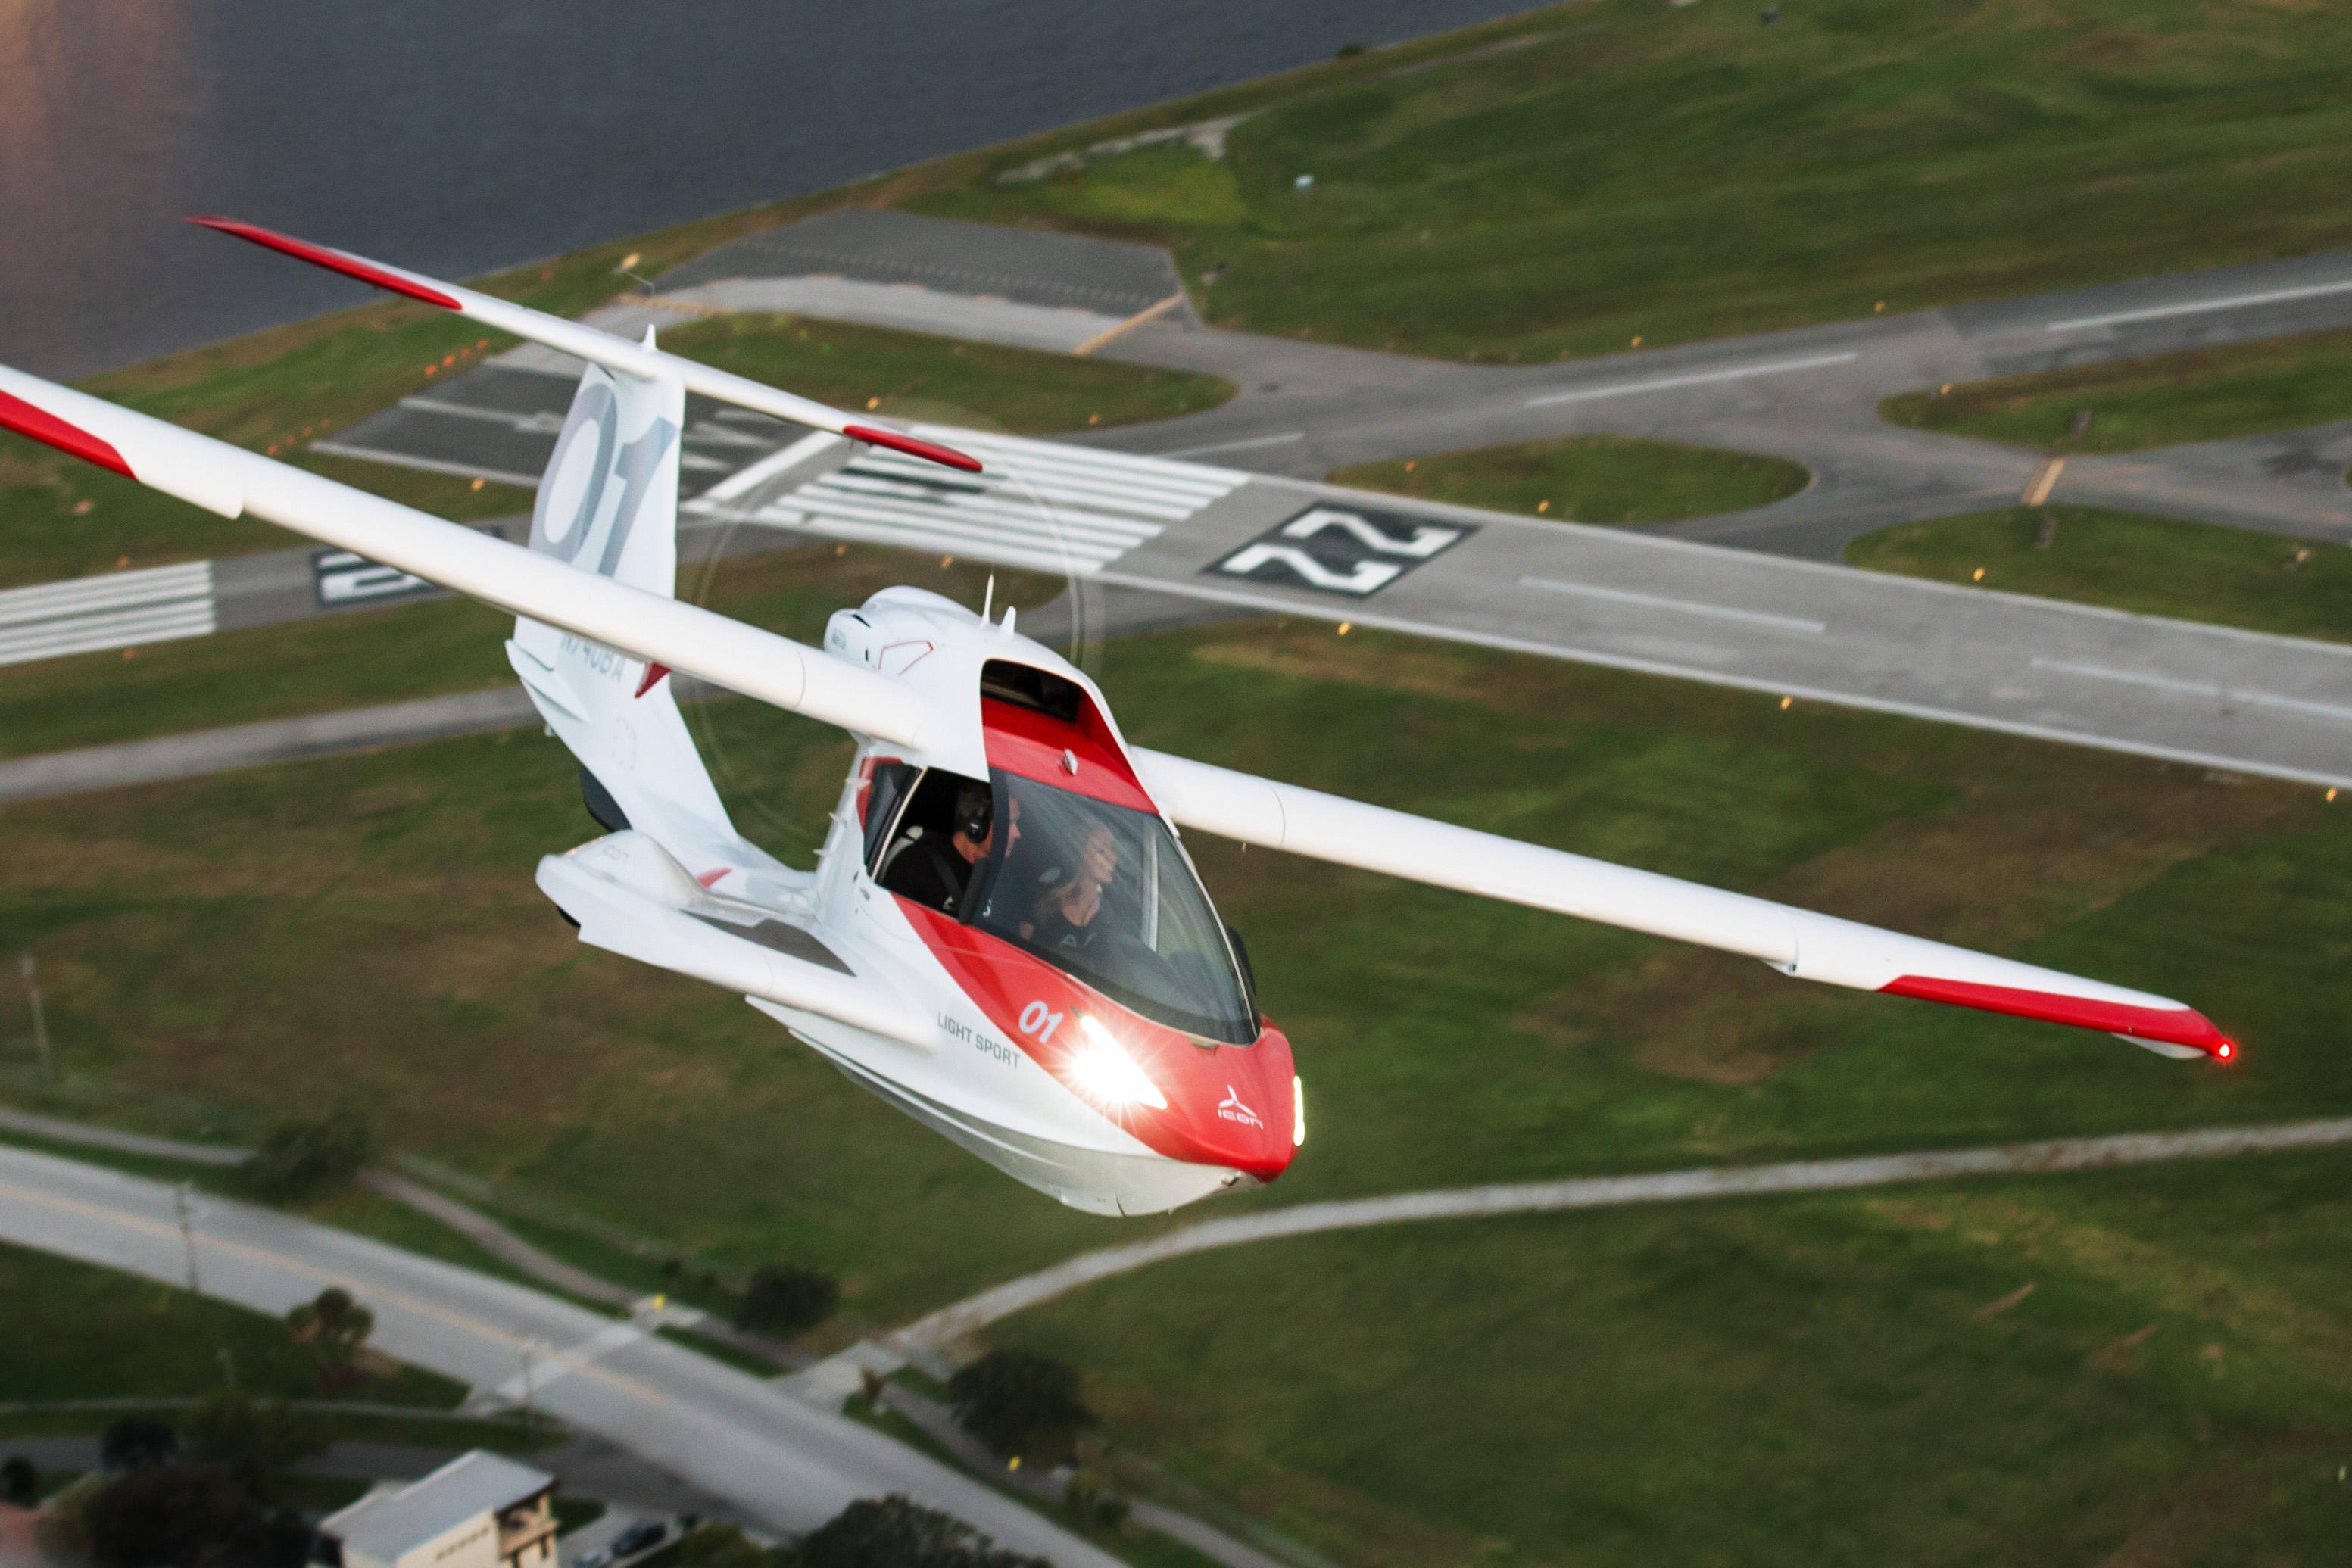 Free photo: Sport Aircraft - Plane, Sport, Nature - Free